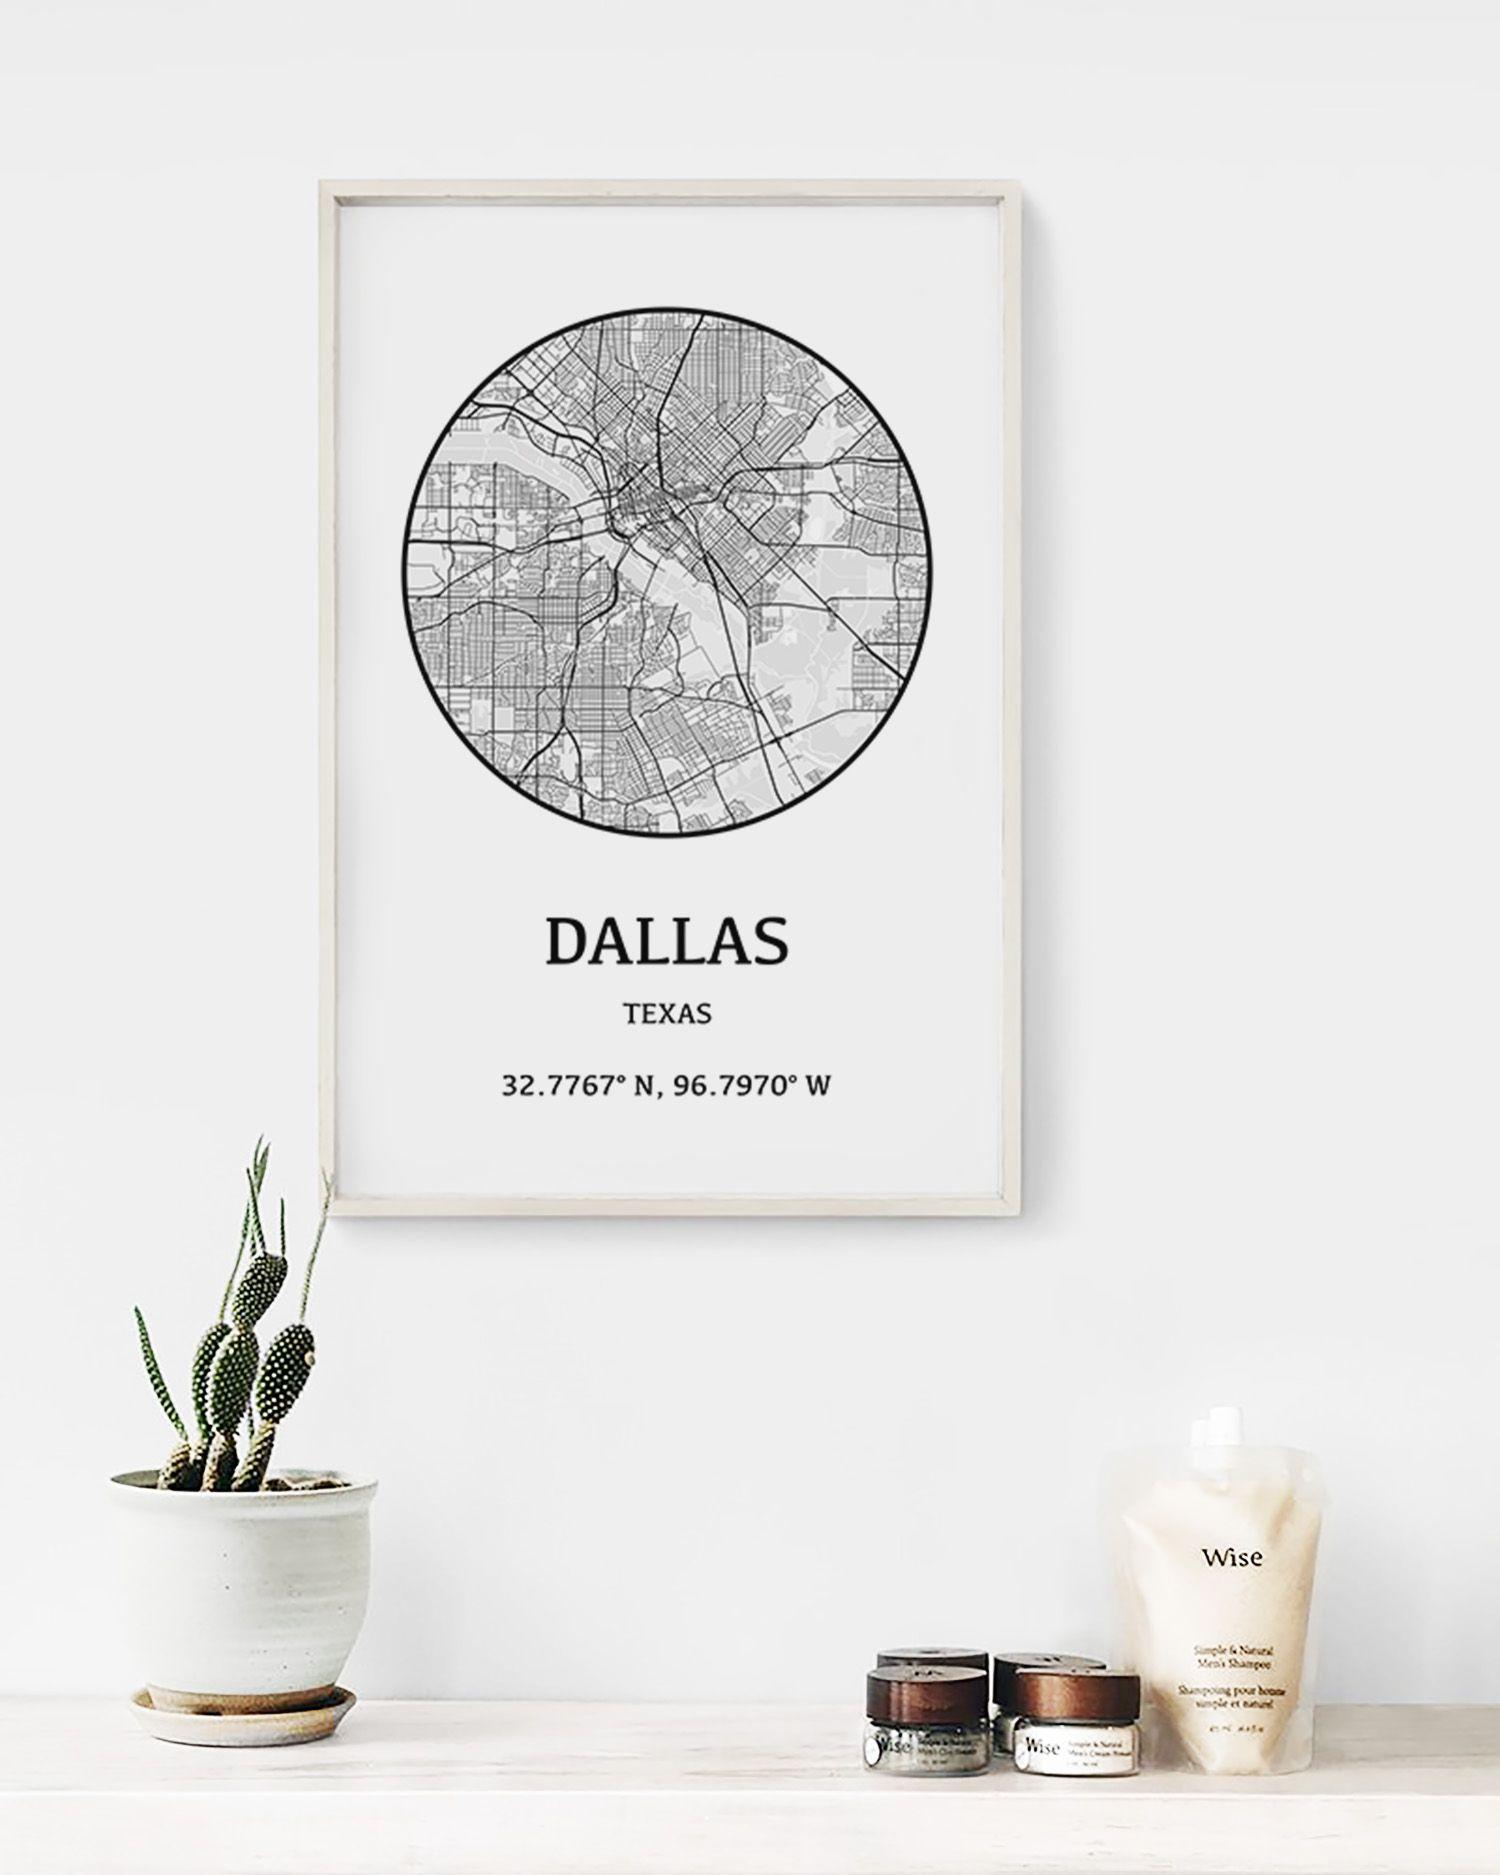 Dallas City Map Poster, Texas Travel Art Print | Cities and Circles ...